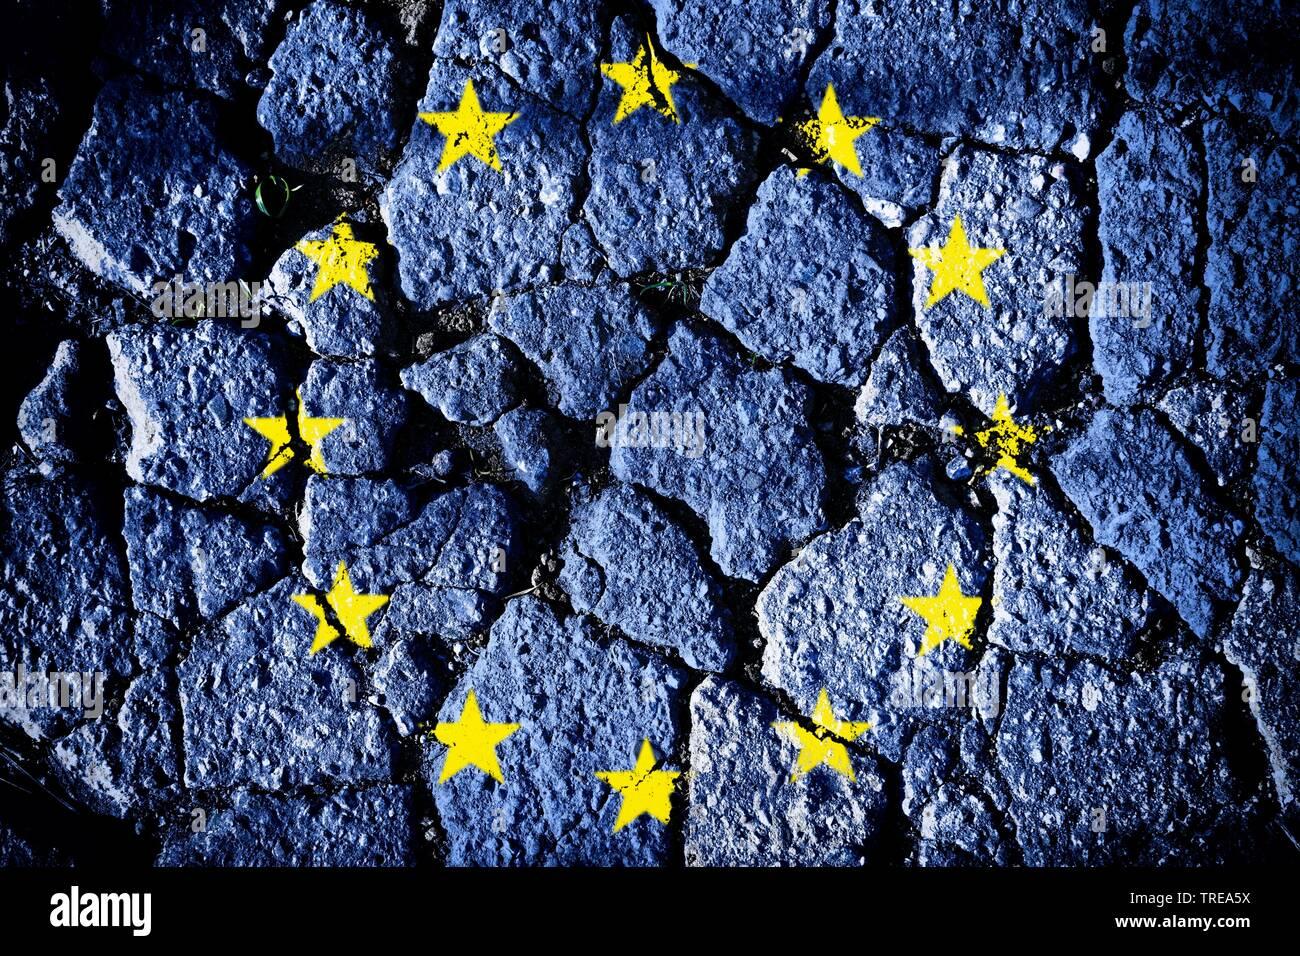 Europaflagge auf bruechigen Grund - Krise in Europa | European flag on fragile ground - Crisis in Europe | BLWS521171.jpg [ (c) blickwinkel/McPHOTO/C. - Stock Image